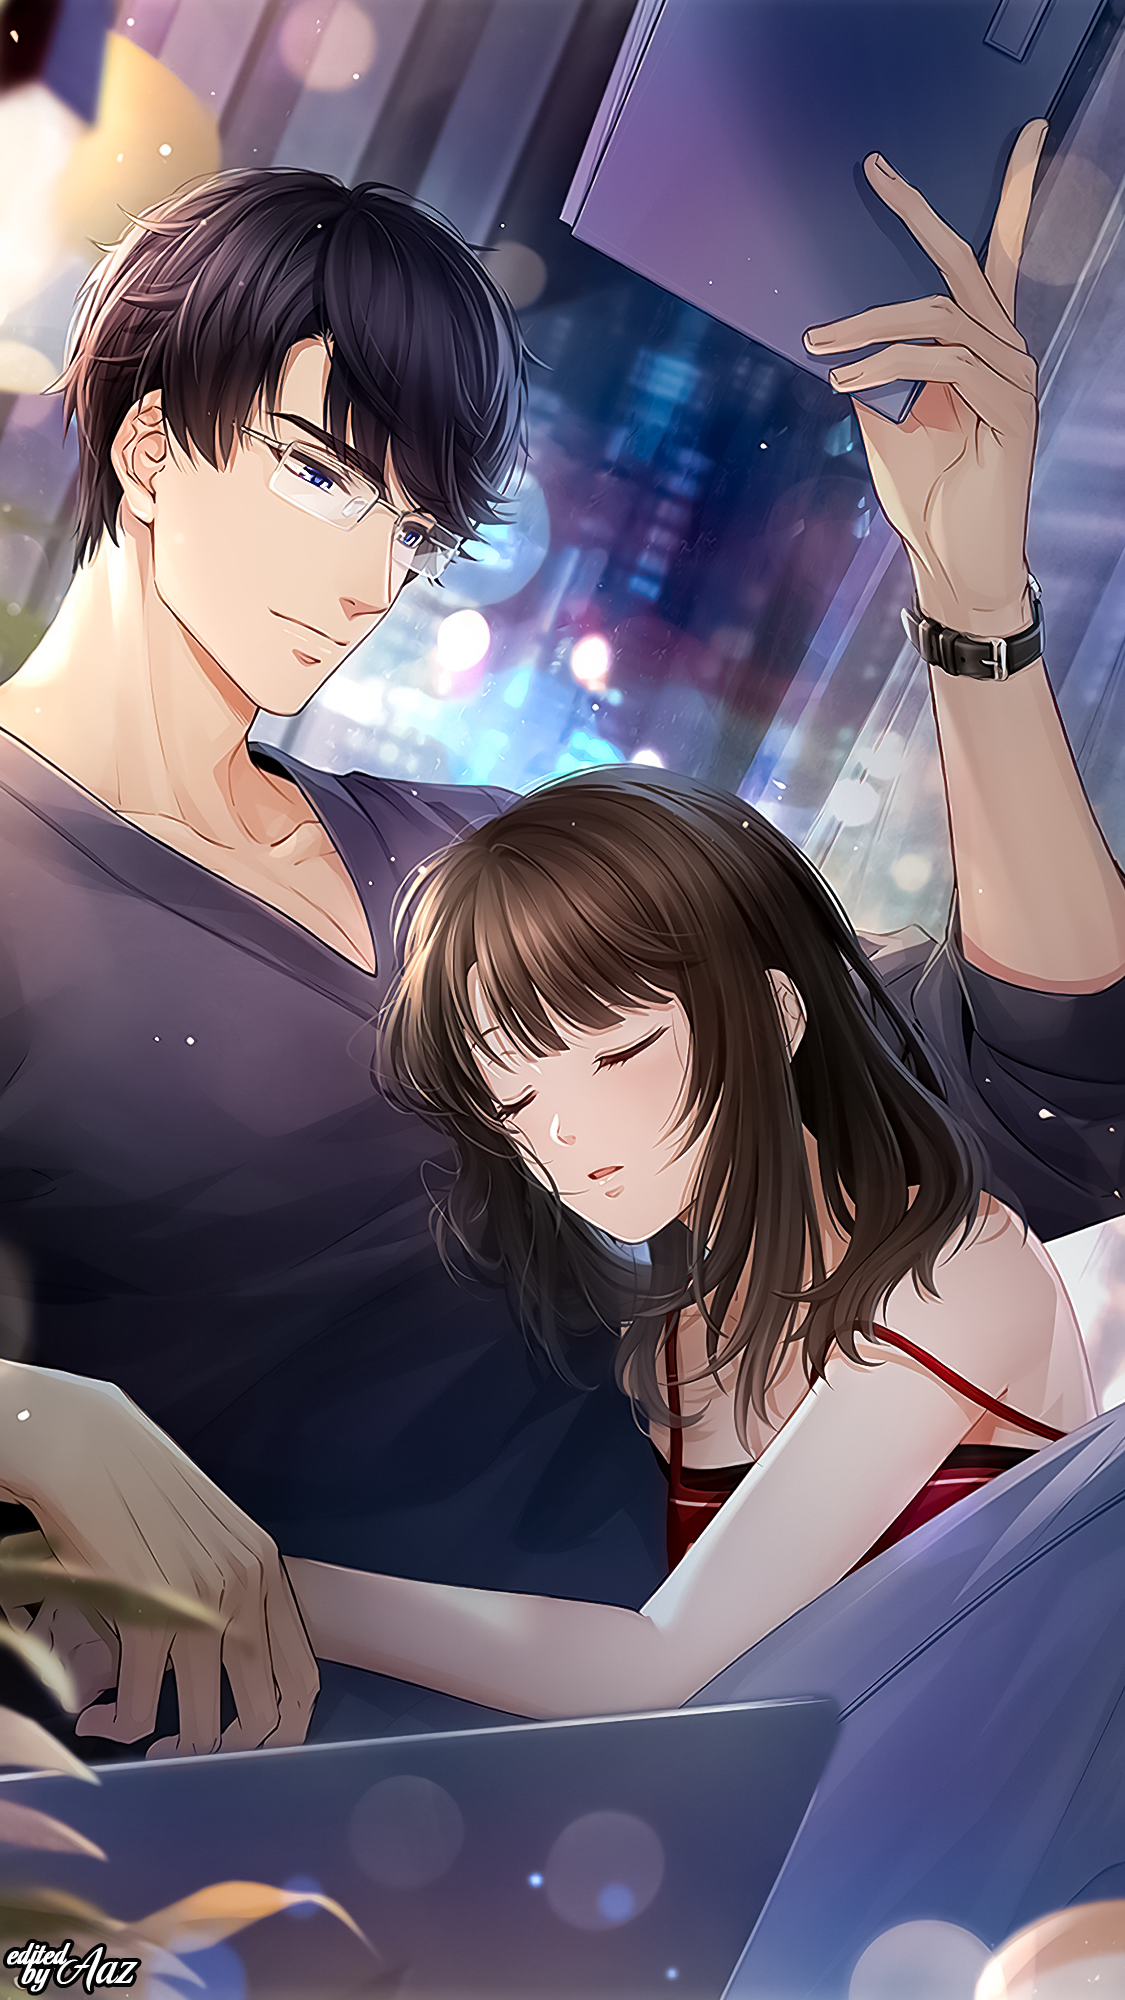 Single Er Topup Event In 2020 Anime Romance Anime Love Anime